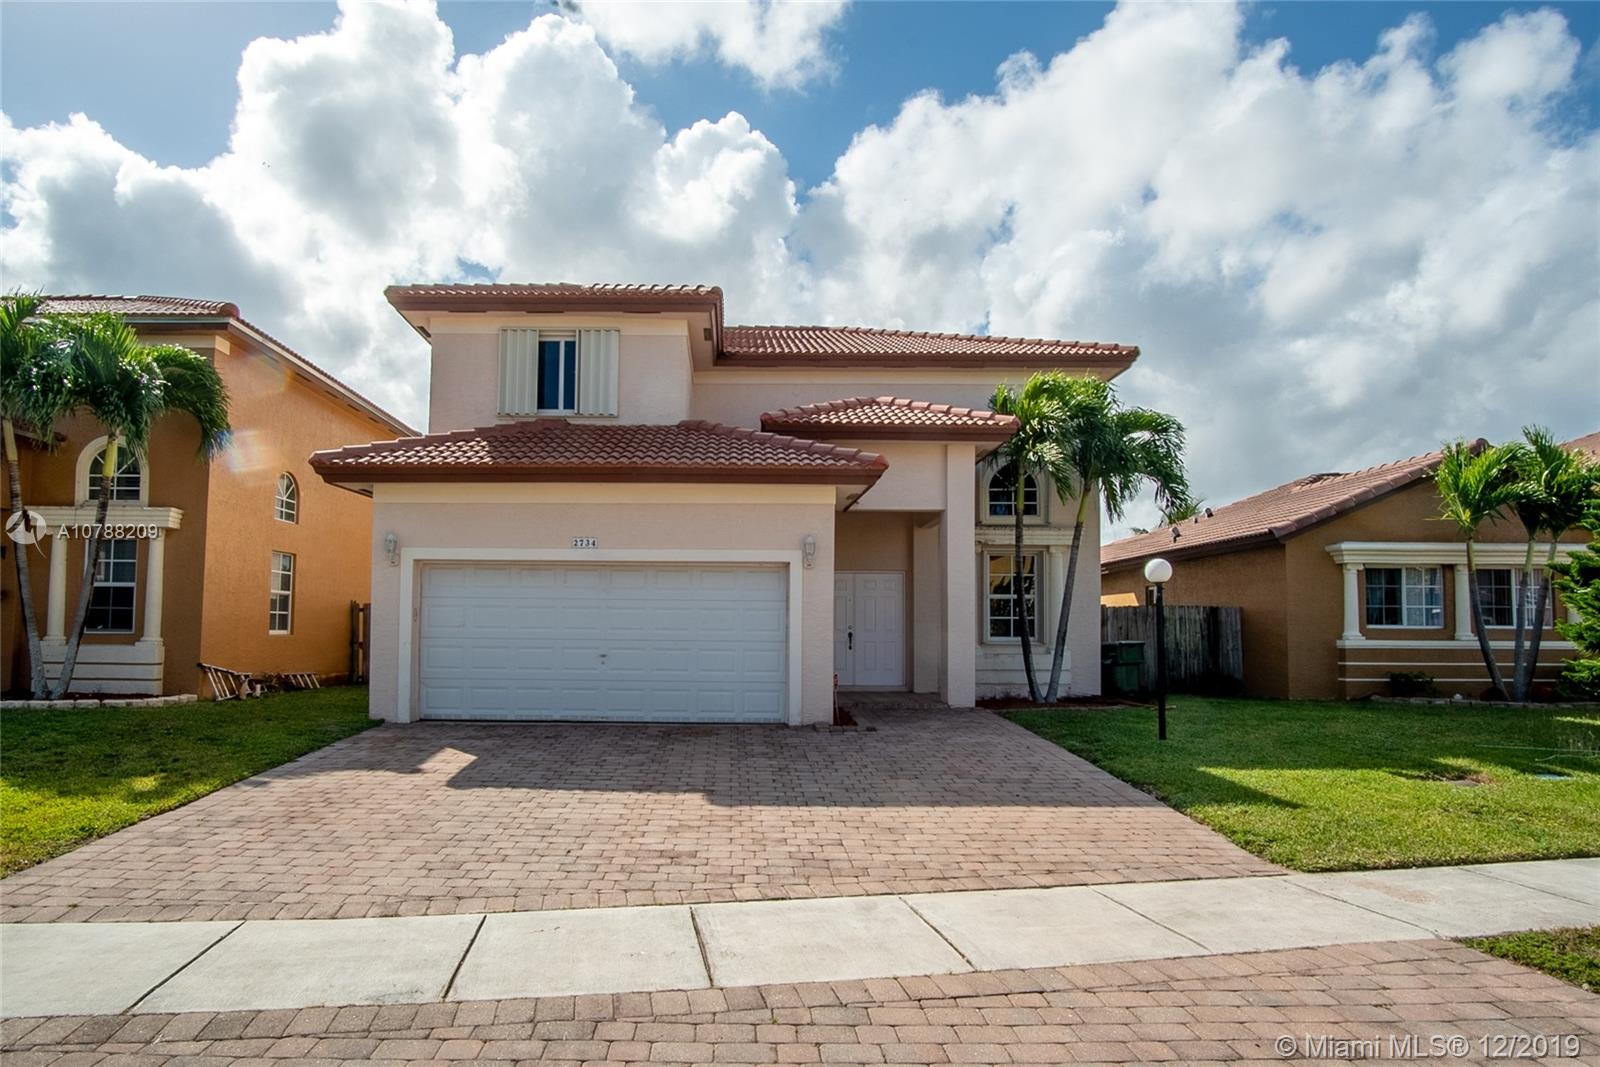 2734 NE 41 RD Property Photo